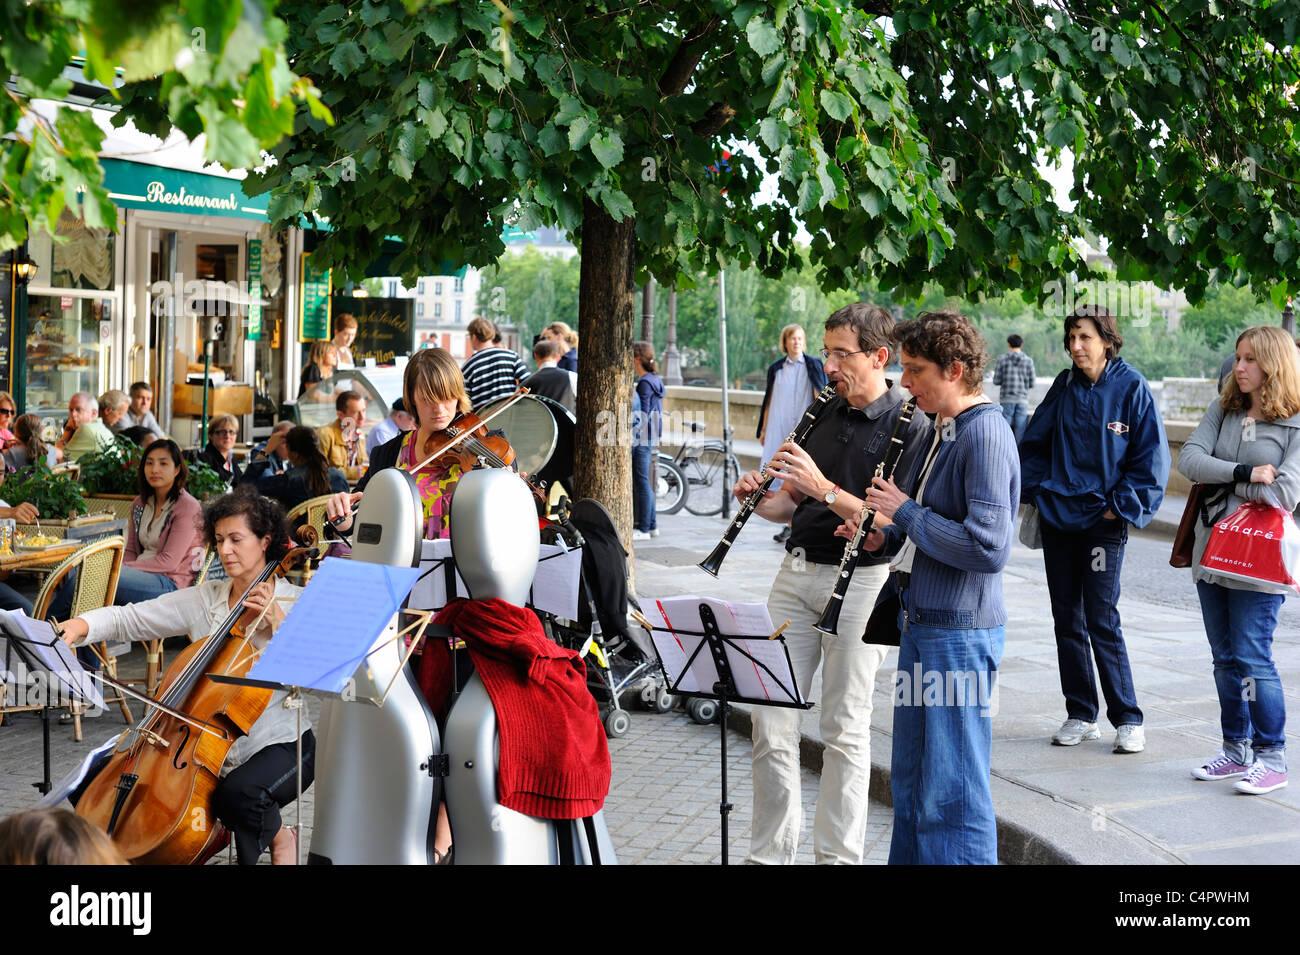 Paris France World Music Day 2011 at ILe Saint Louis - Stock Image